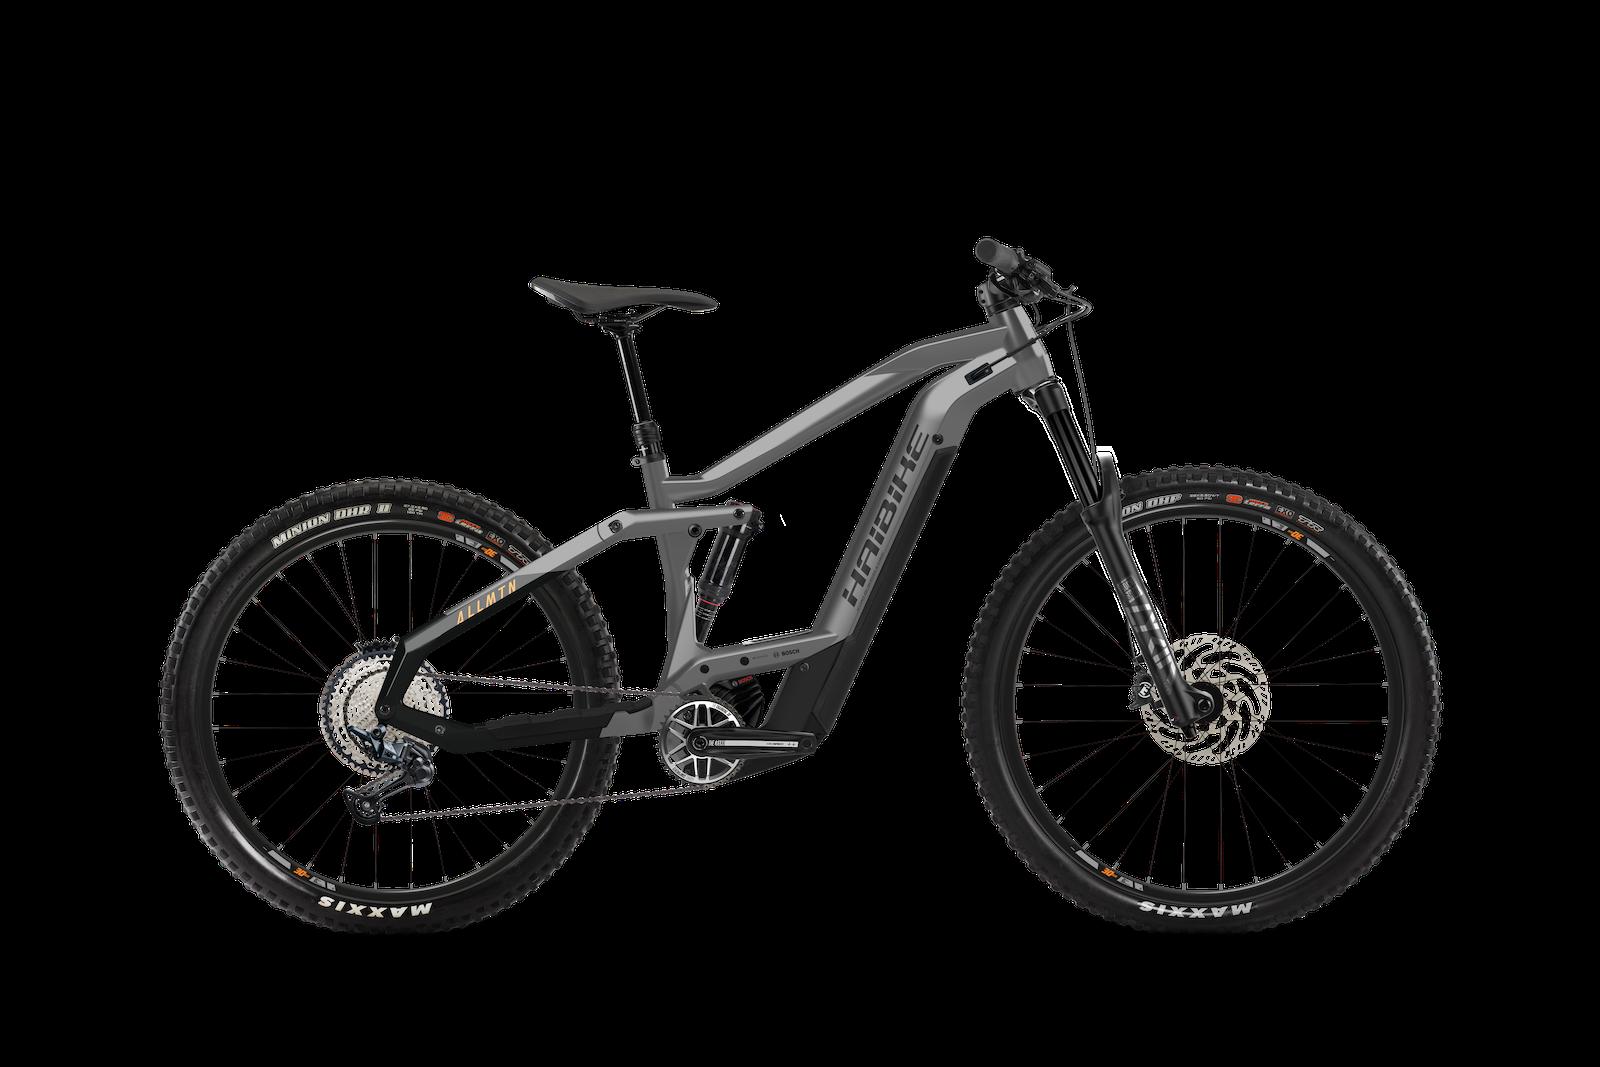 HAIBIKE ALLMTN 4 625Wh grey-black 2021